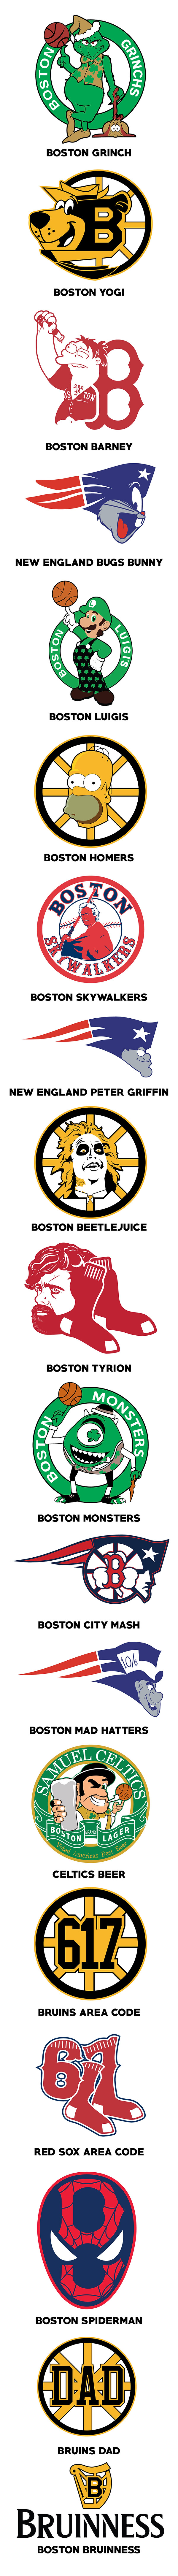 ALL_MASHUPS_Boston.jpg